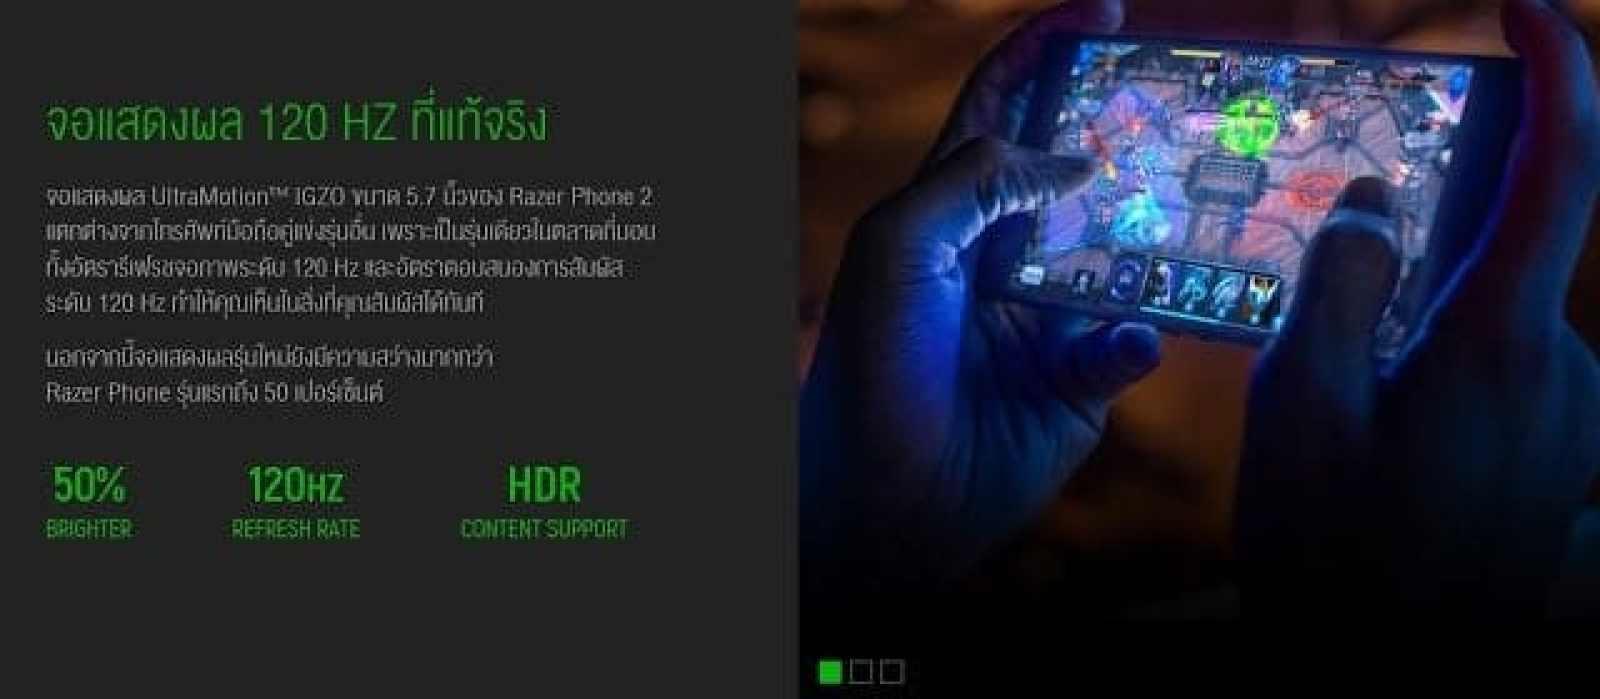 - Screenshot 9 7 - AIS วางจำหน่าย Razer Phone 2 ในไทย ราคา 27,990 บาท